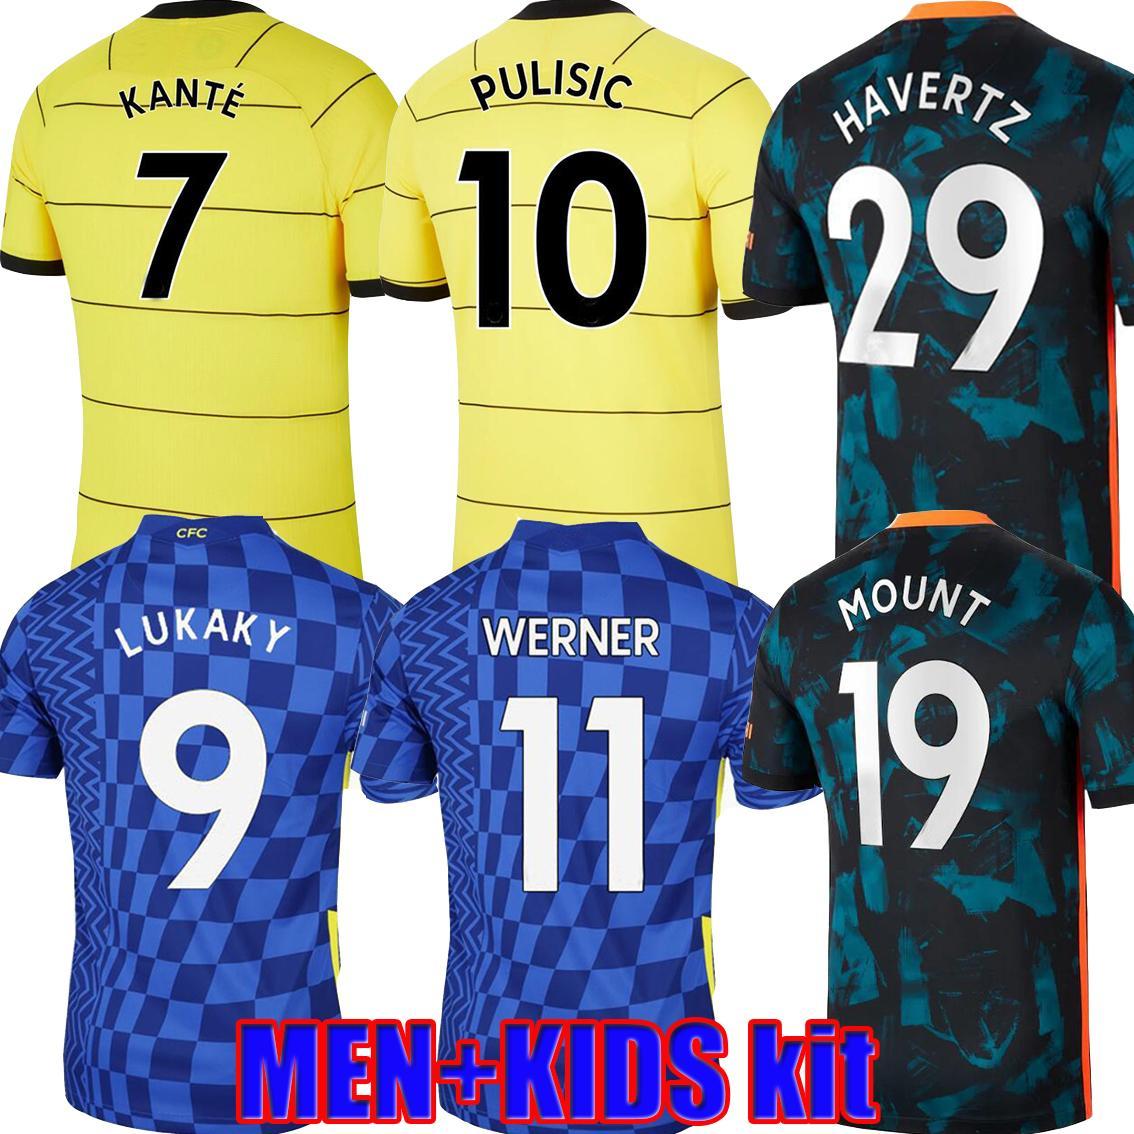 Fans Player Version 21 22 CFC Lukaku 9 Werner Havvertz Soccer Jerseys Sharaham Chilwell Ziyech Chemise de football Pulisic Jorginho Camiseta 2021 2022 Kante Hommes Kit Finales